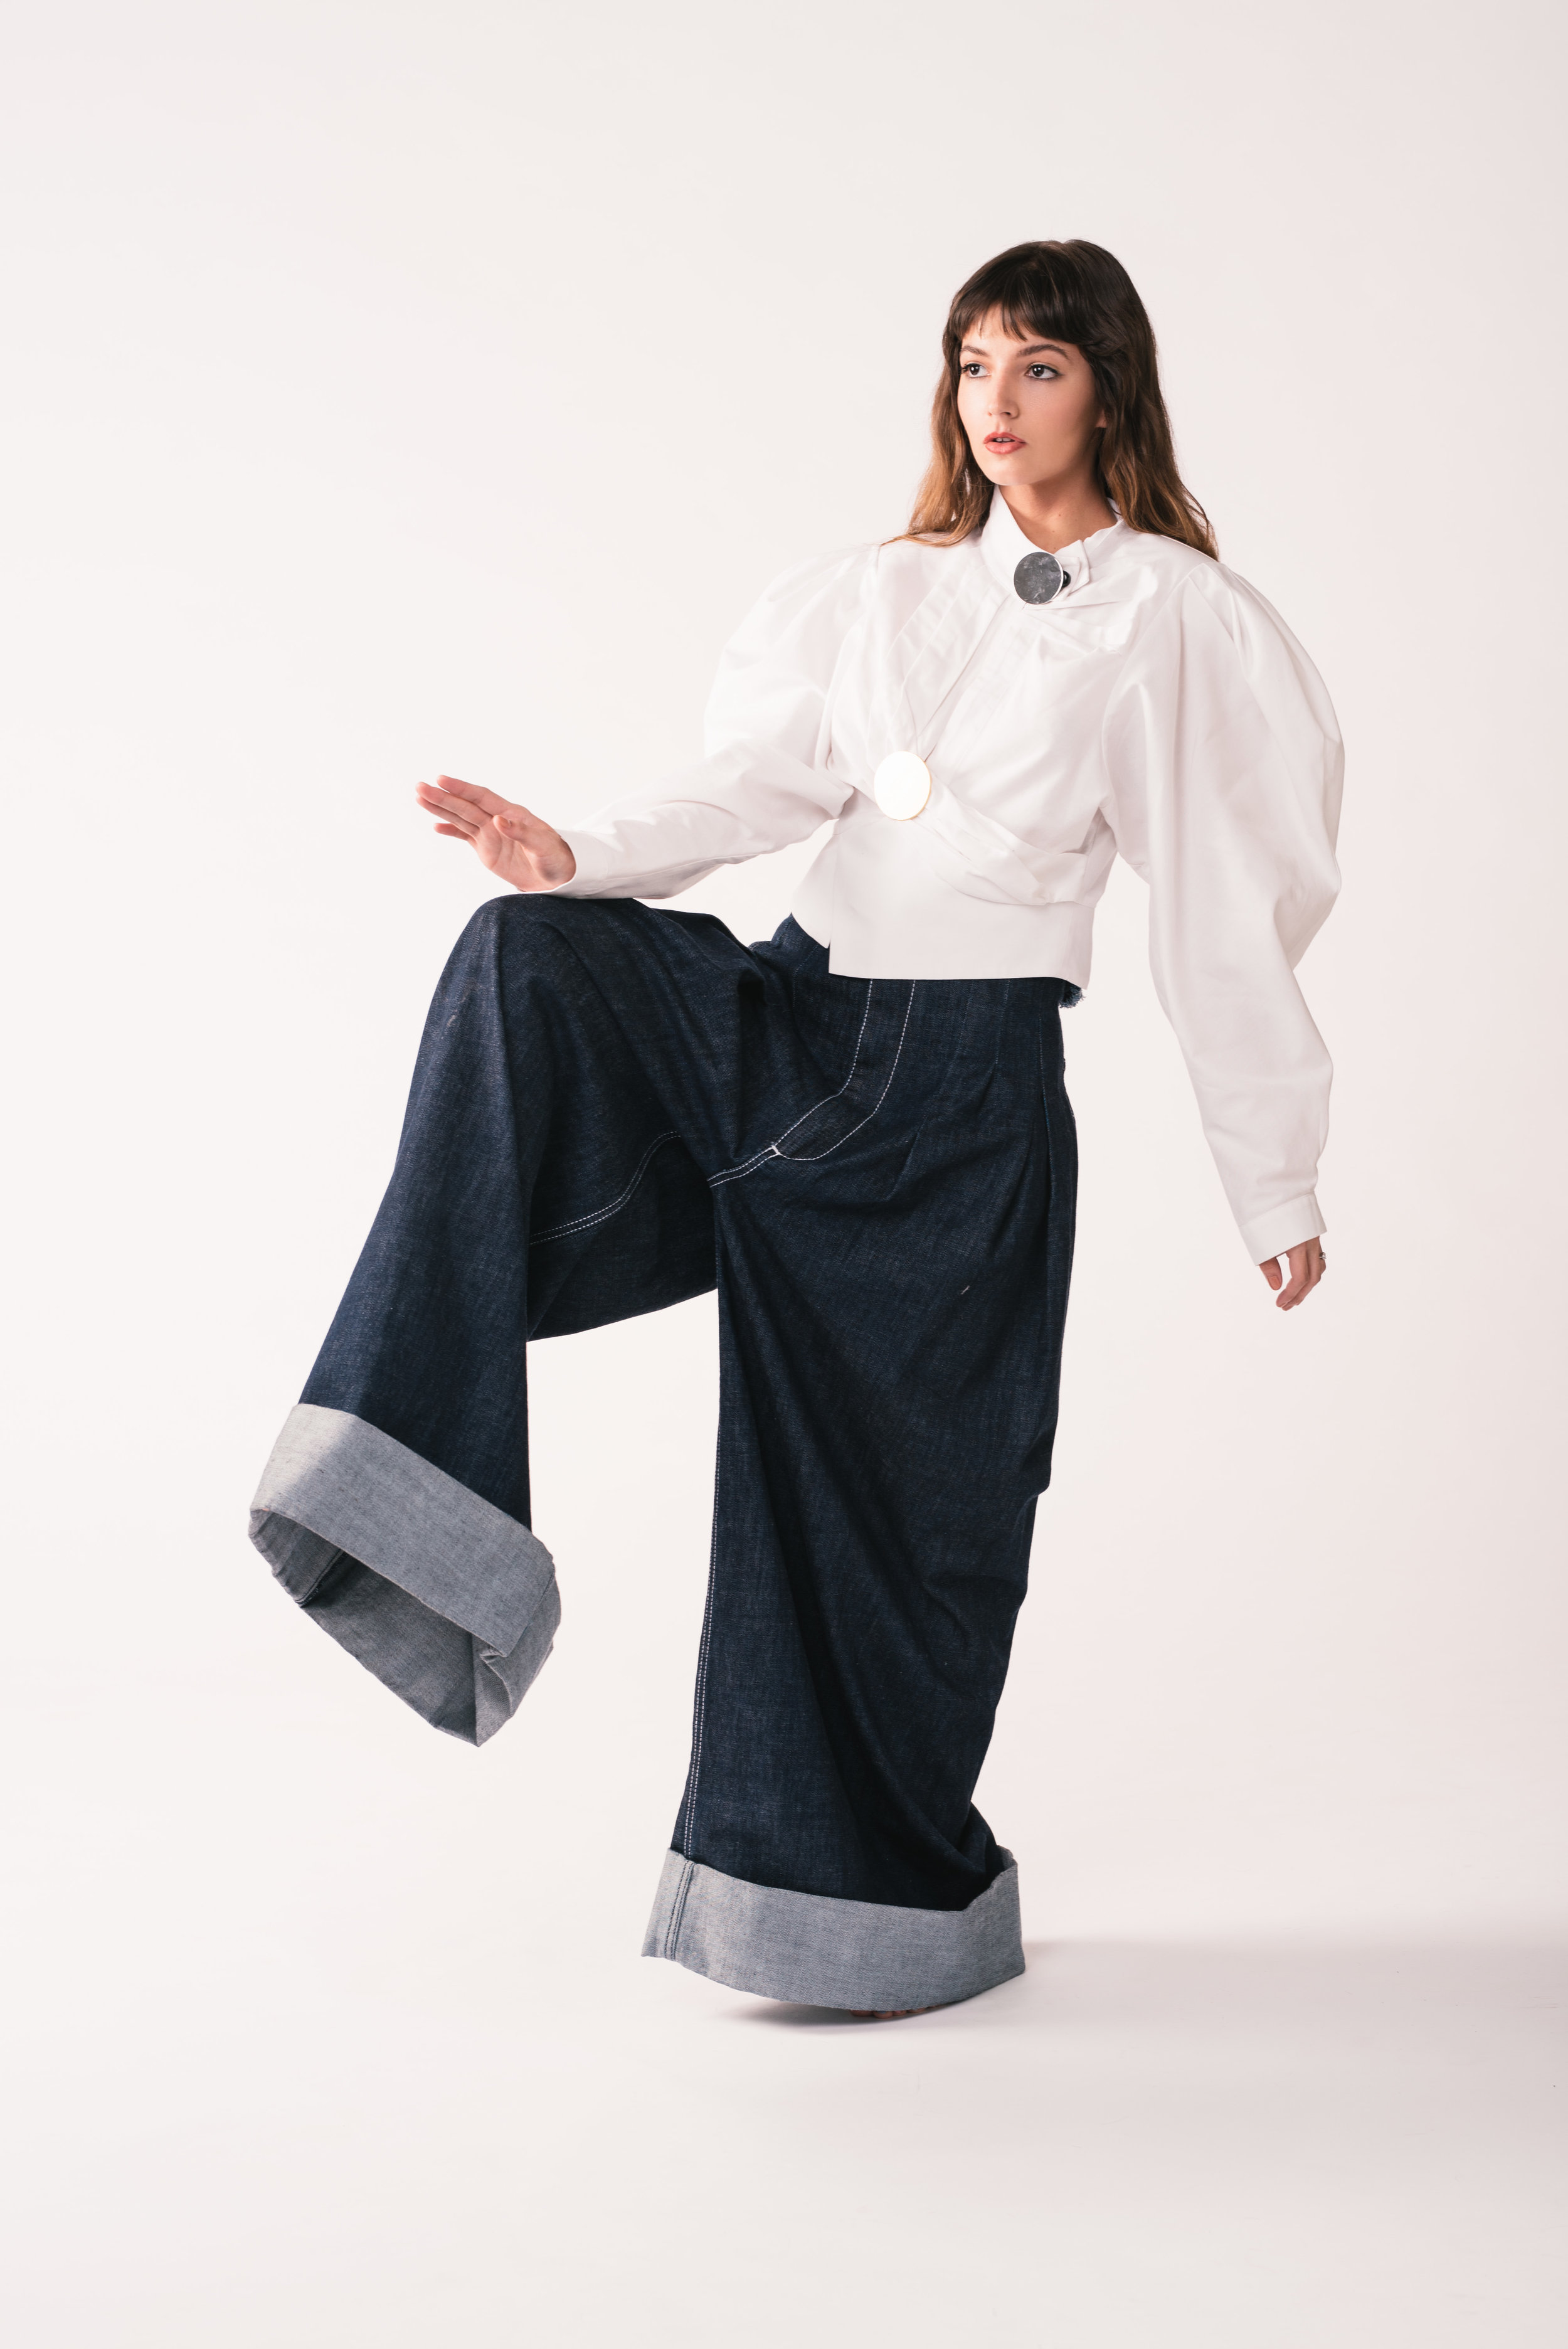 Shirt: Jacquemus  Pants: Jacquemus